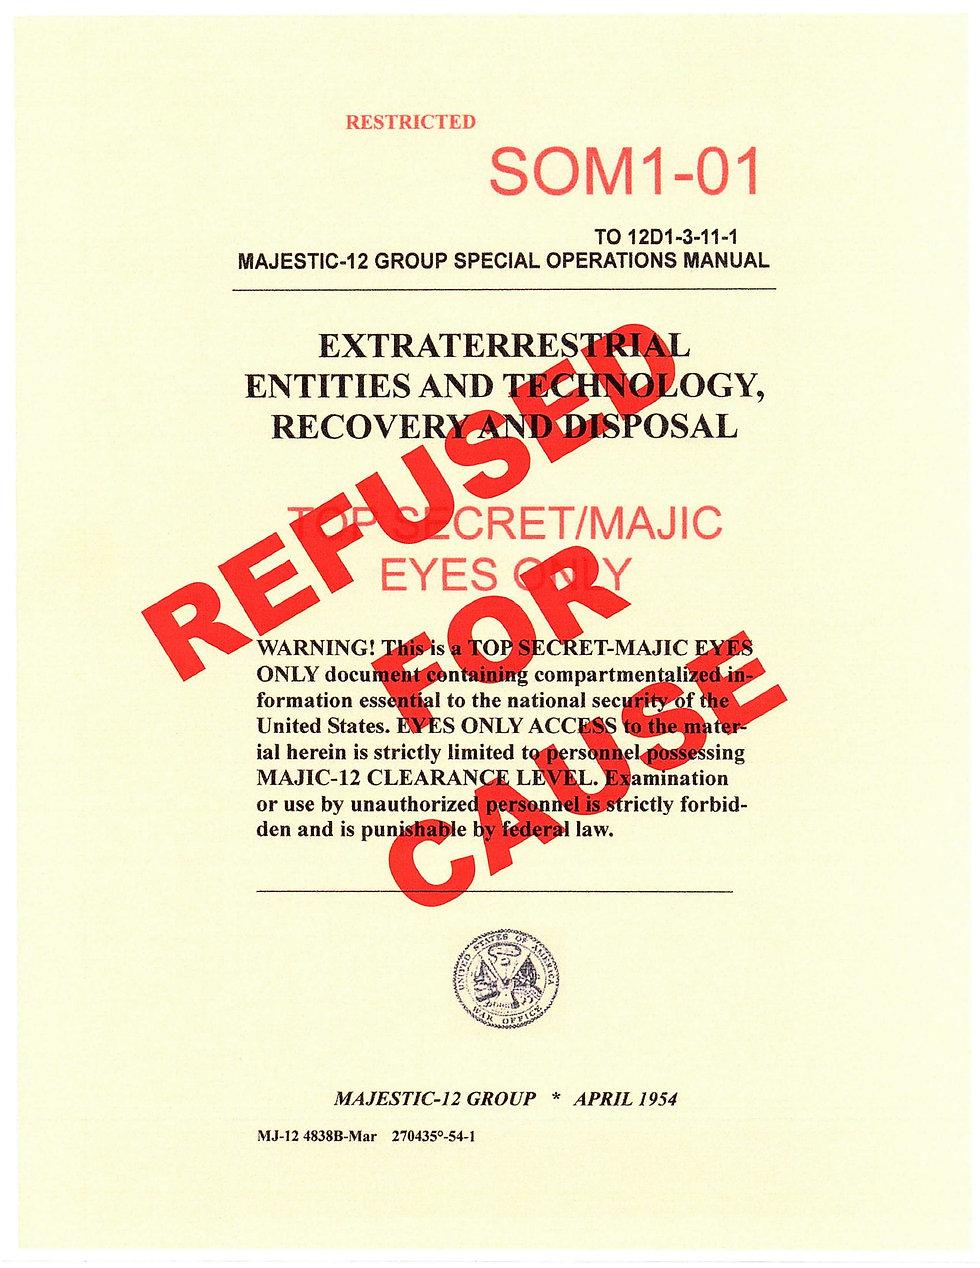 MJ12 Manual - REFUSED-01.jpg